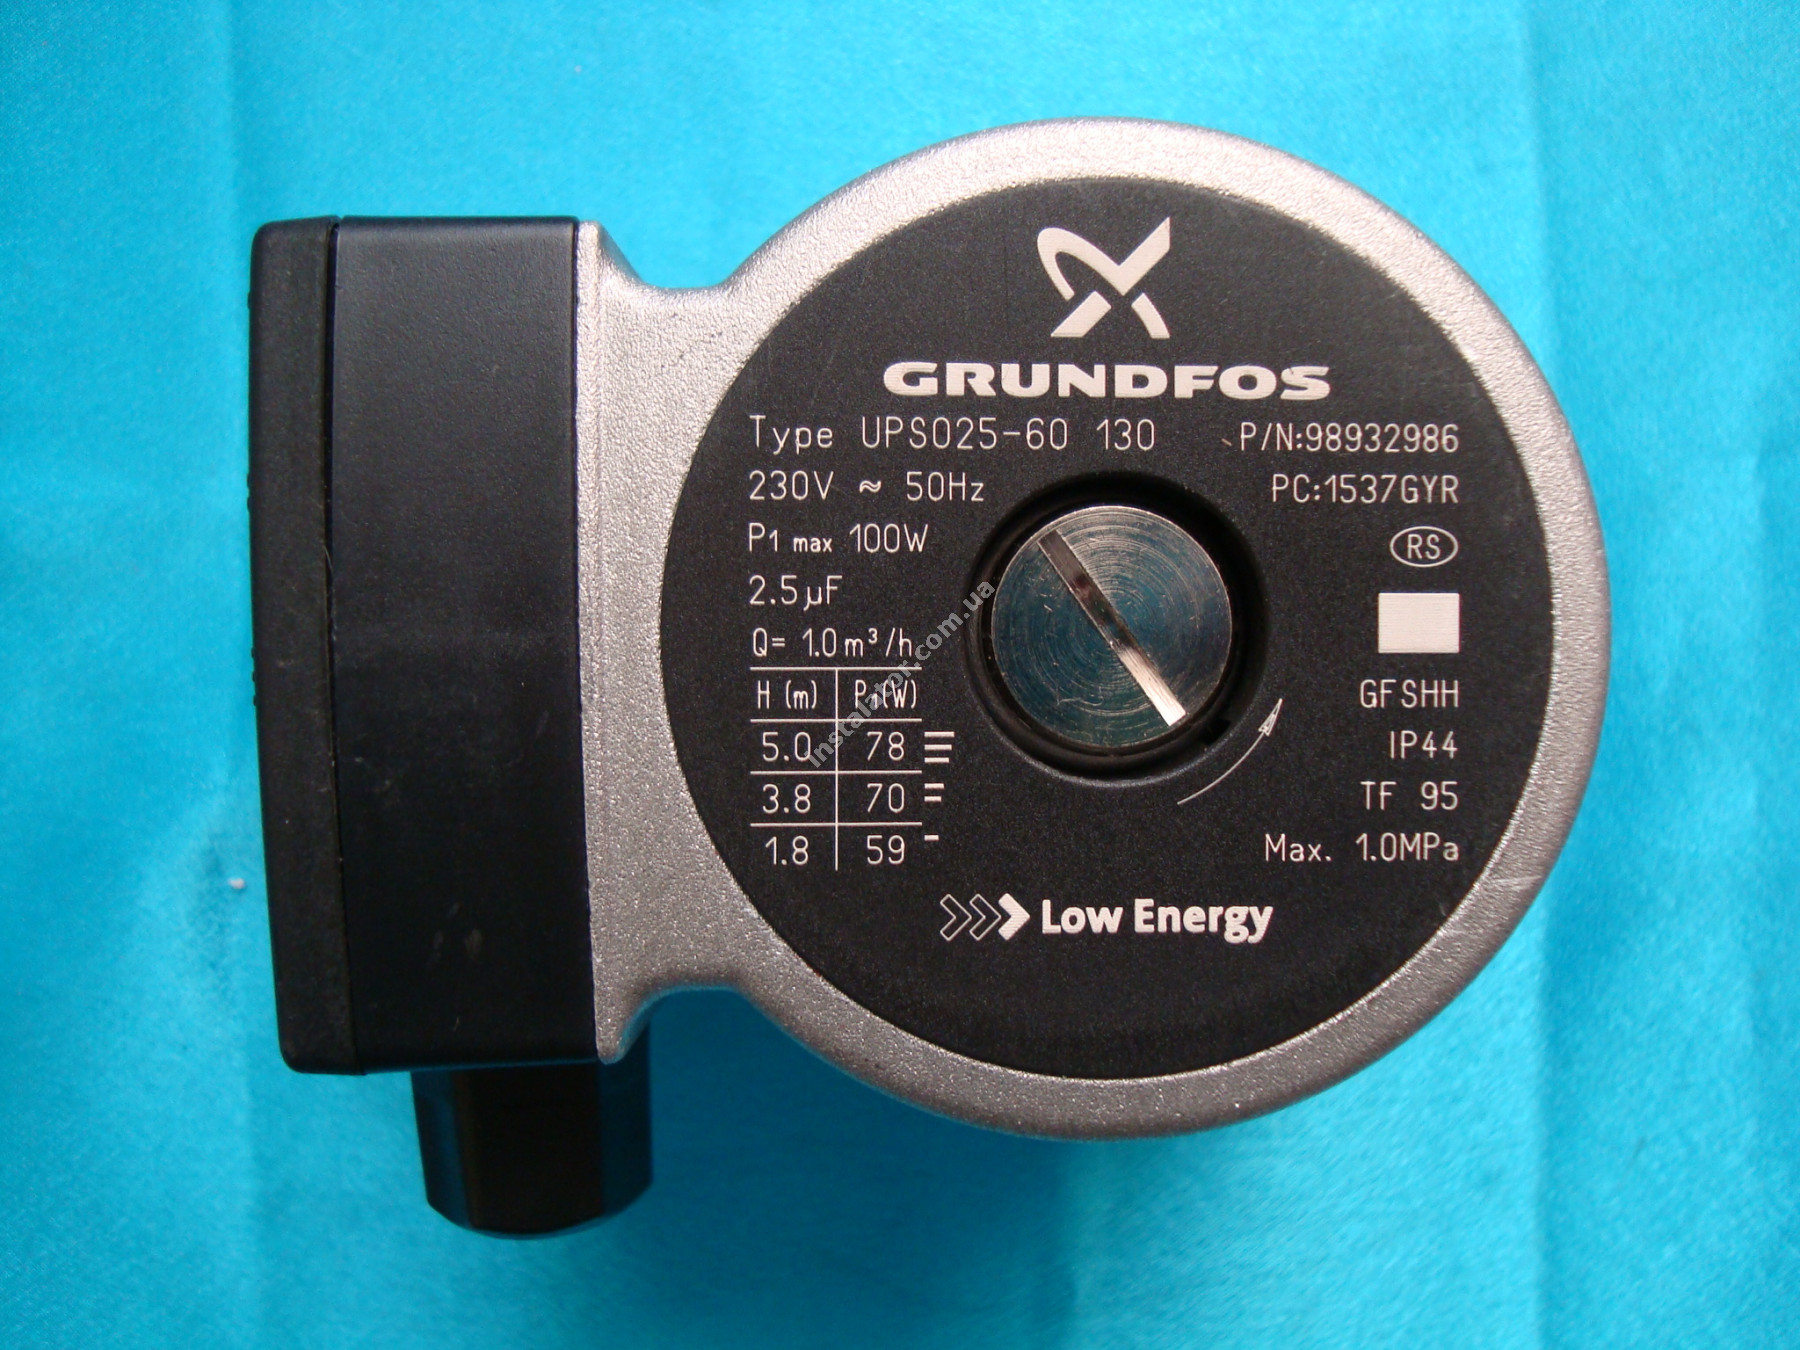 150100102 Циркуляційний насос Grundfos UPS 25-60 (база 130) full-image-2